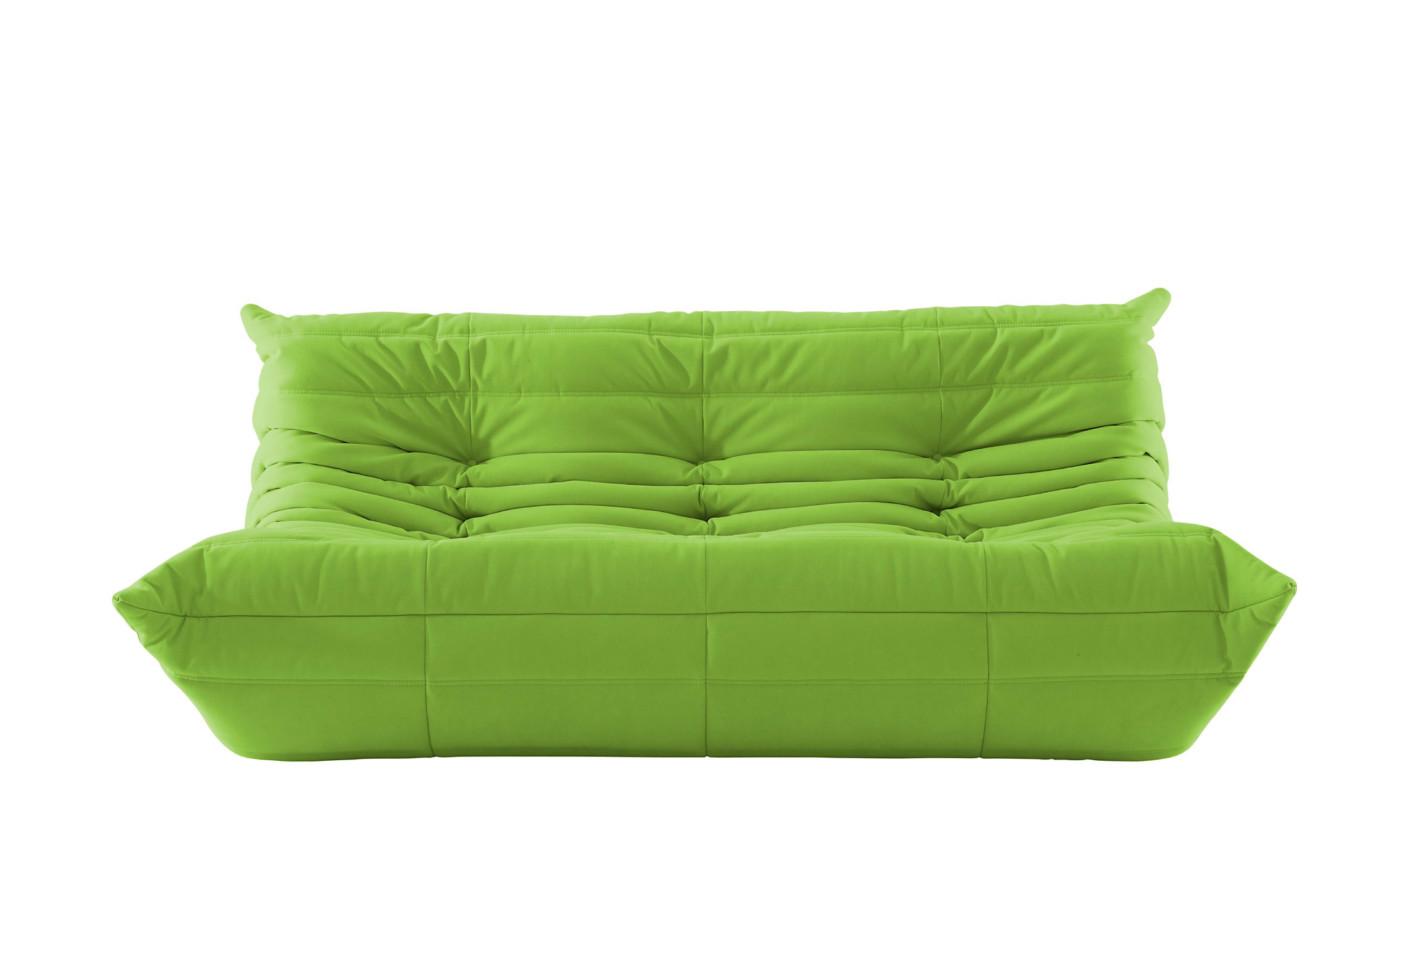 togo sofa 3 sitzer von ligne roset stylepark. Black Bedroom Furniture Sets. Home Design Ideas